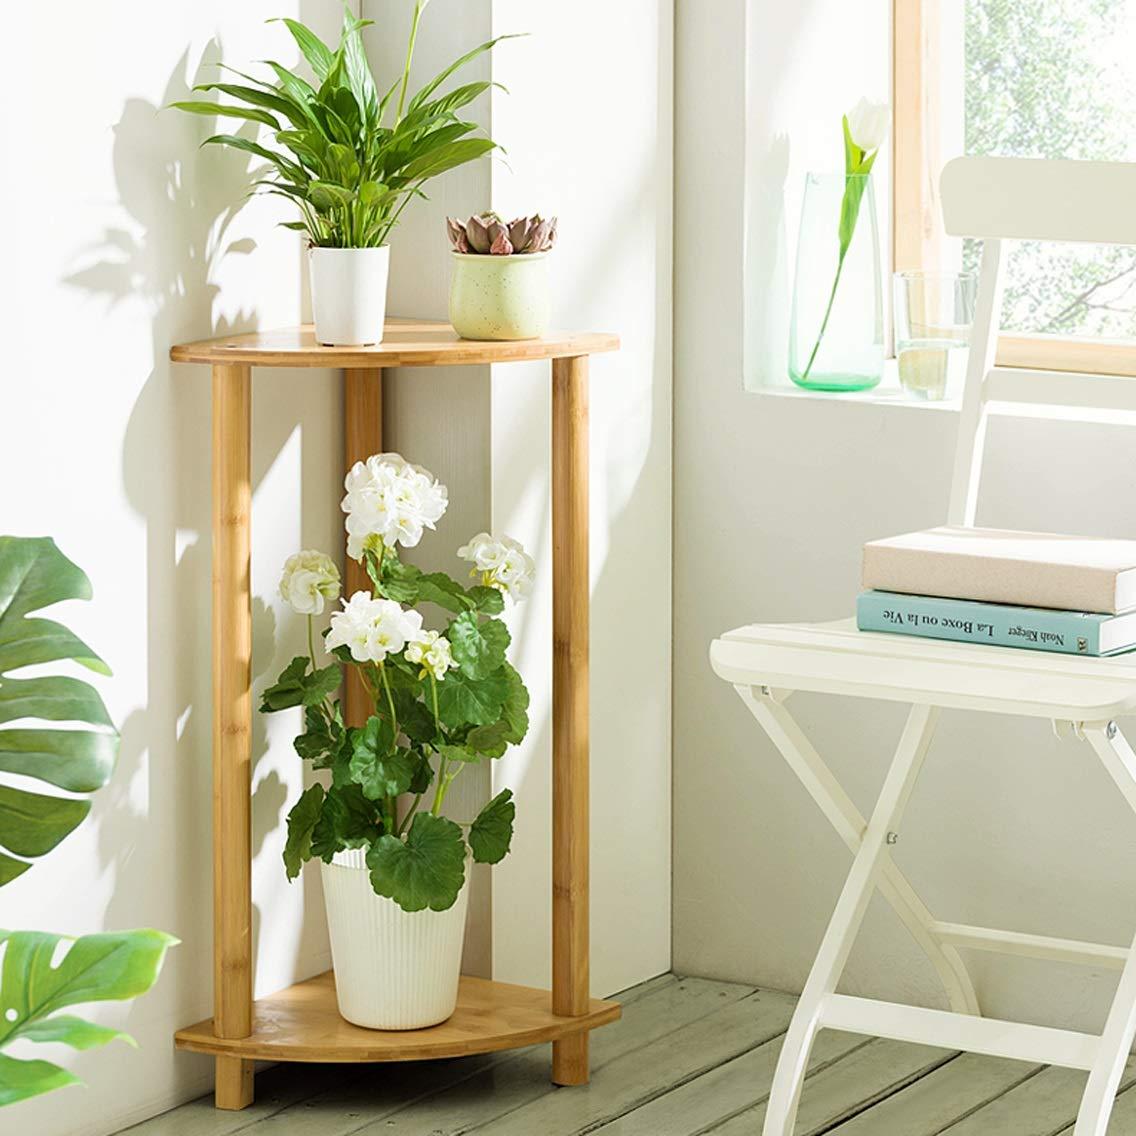 LRW Fan-Shaped Balcony Flower Rack Indoor Multi-Storey Living Room Flower Pot Rack, 70 Centimeters Tall